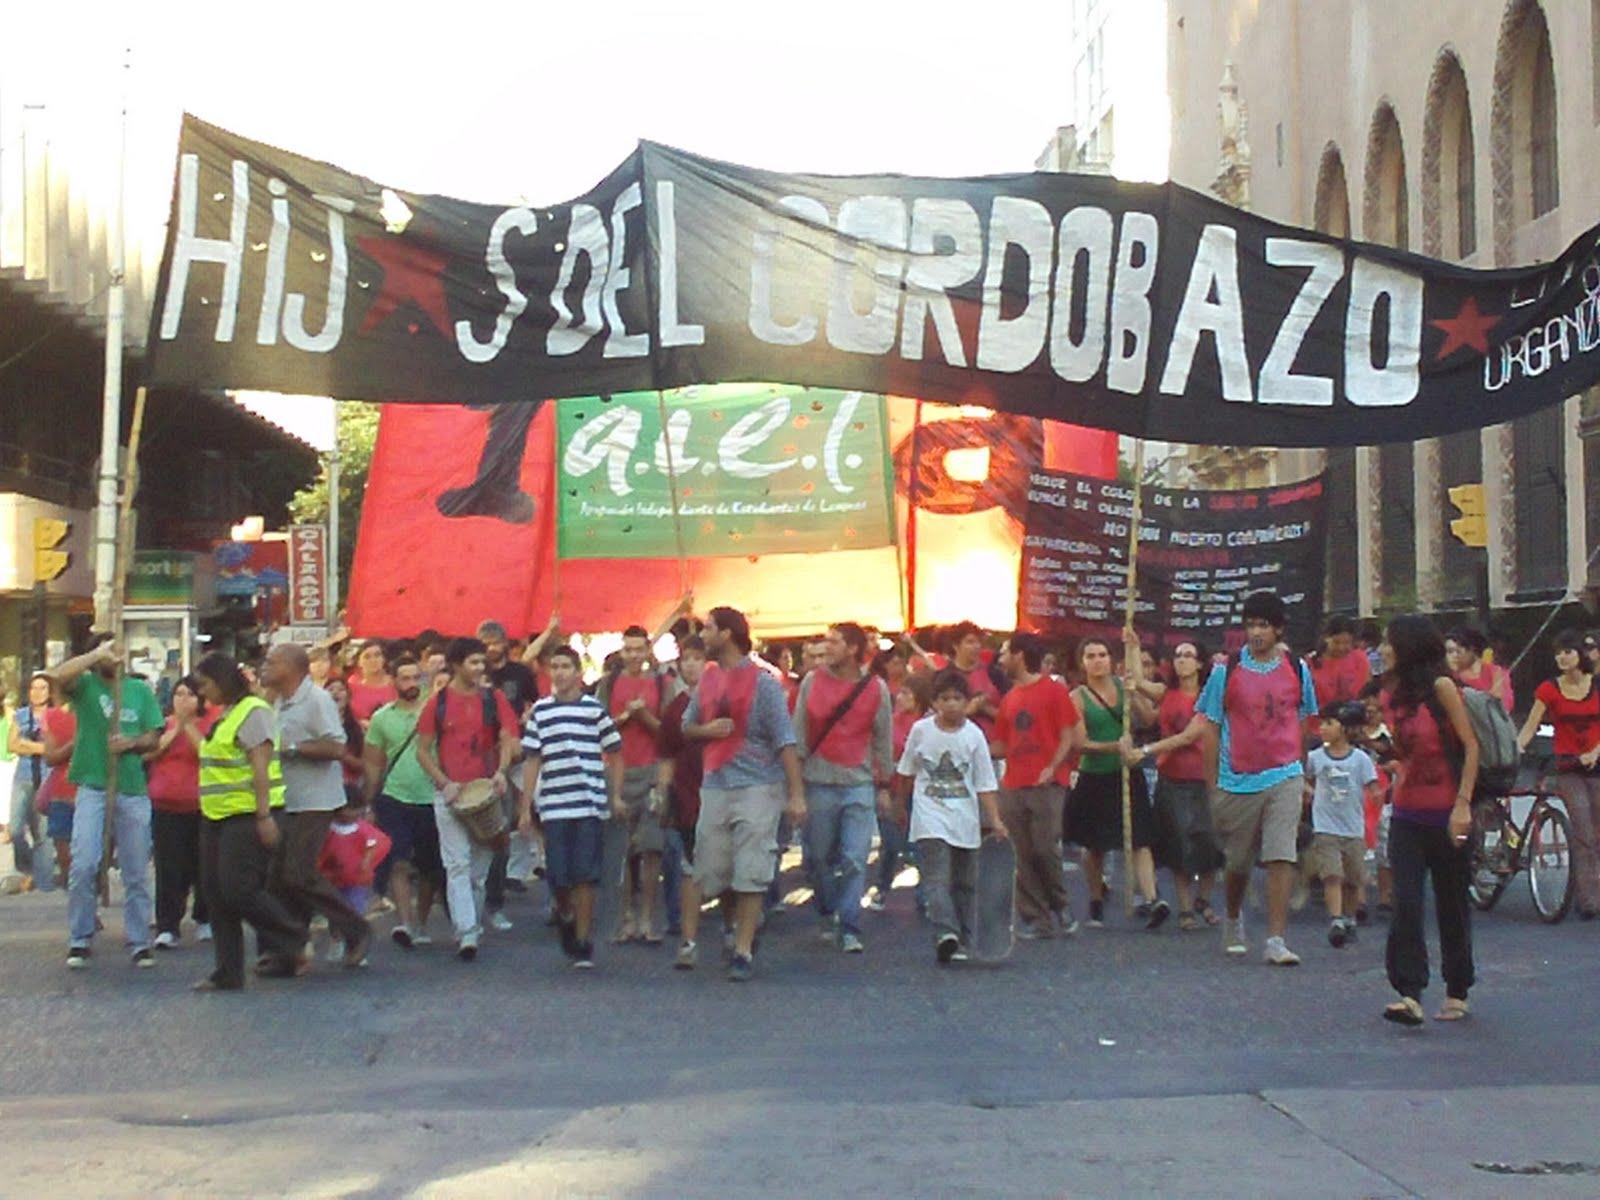 http://2.bp.blogspot.com/_wom5Fgdyq7o/S6w3I5JYYvI/AAAAAAAAAdg/9CQsHXNdd5Q/s1600/Hijos+del+Cordobazo.JPG